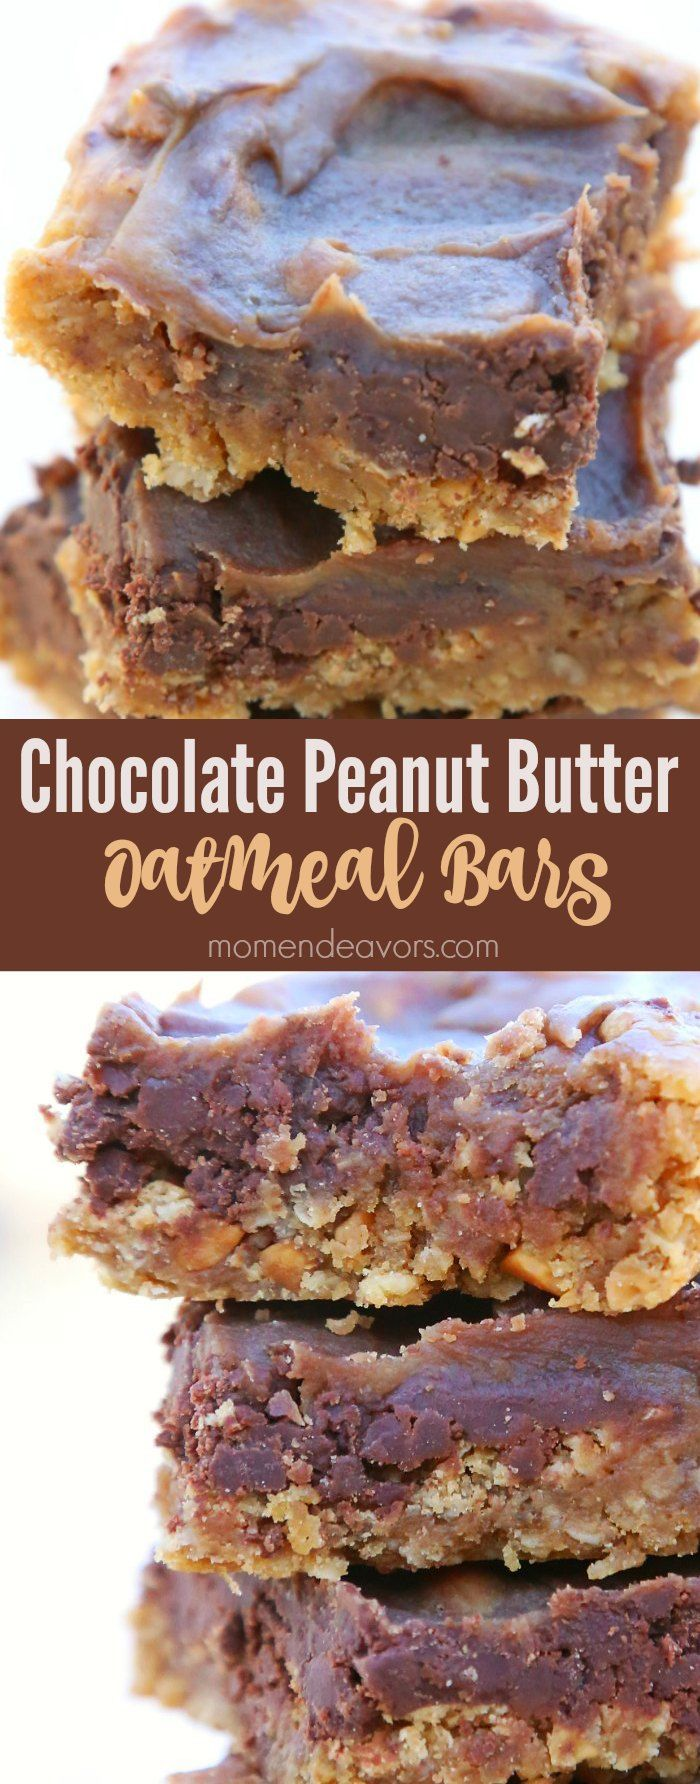 Chocolate+Peanut+Butter+Oatmeal+Bars+-+SO+good!!+